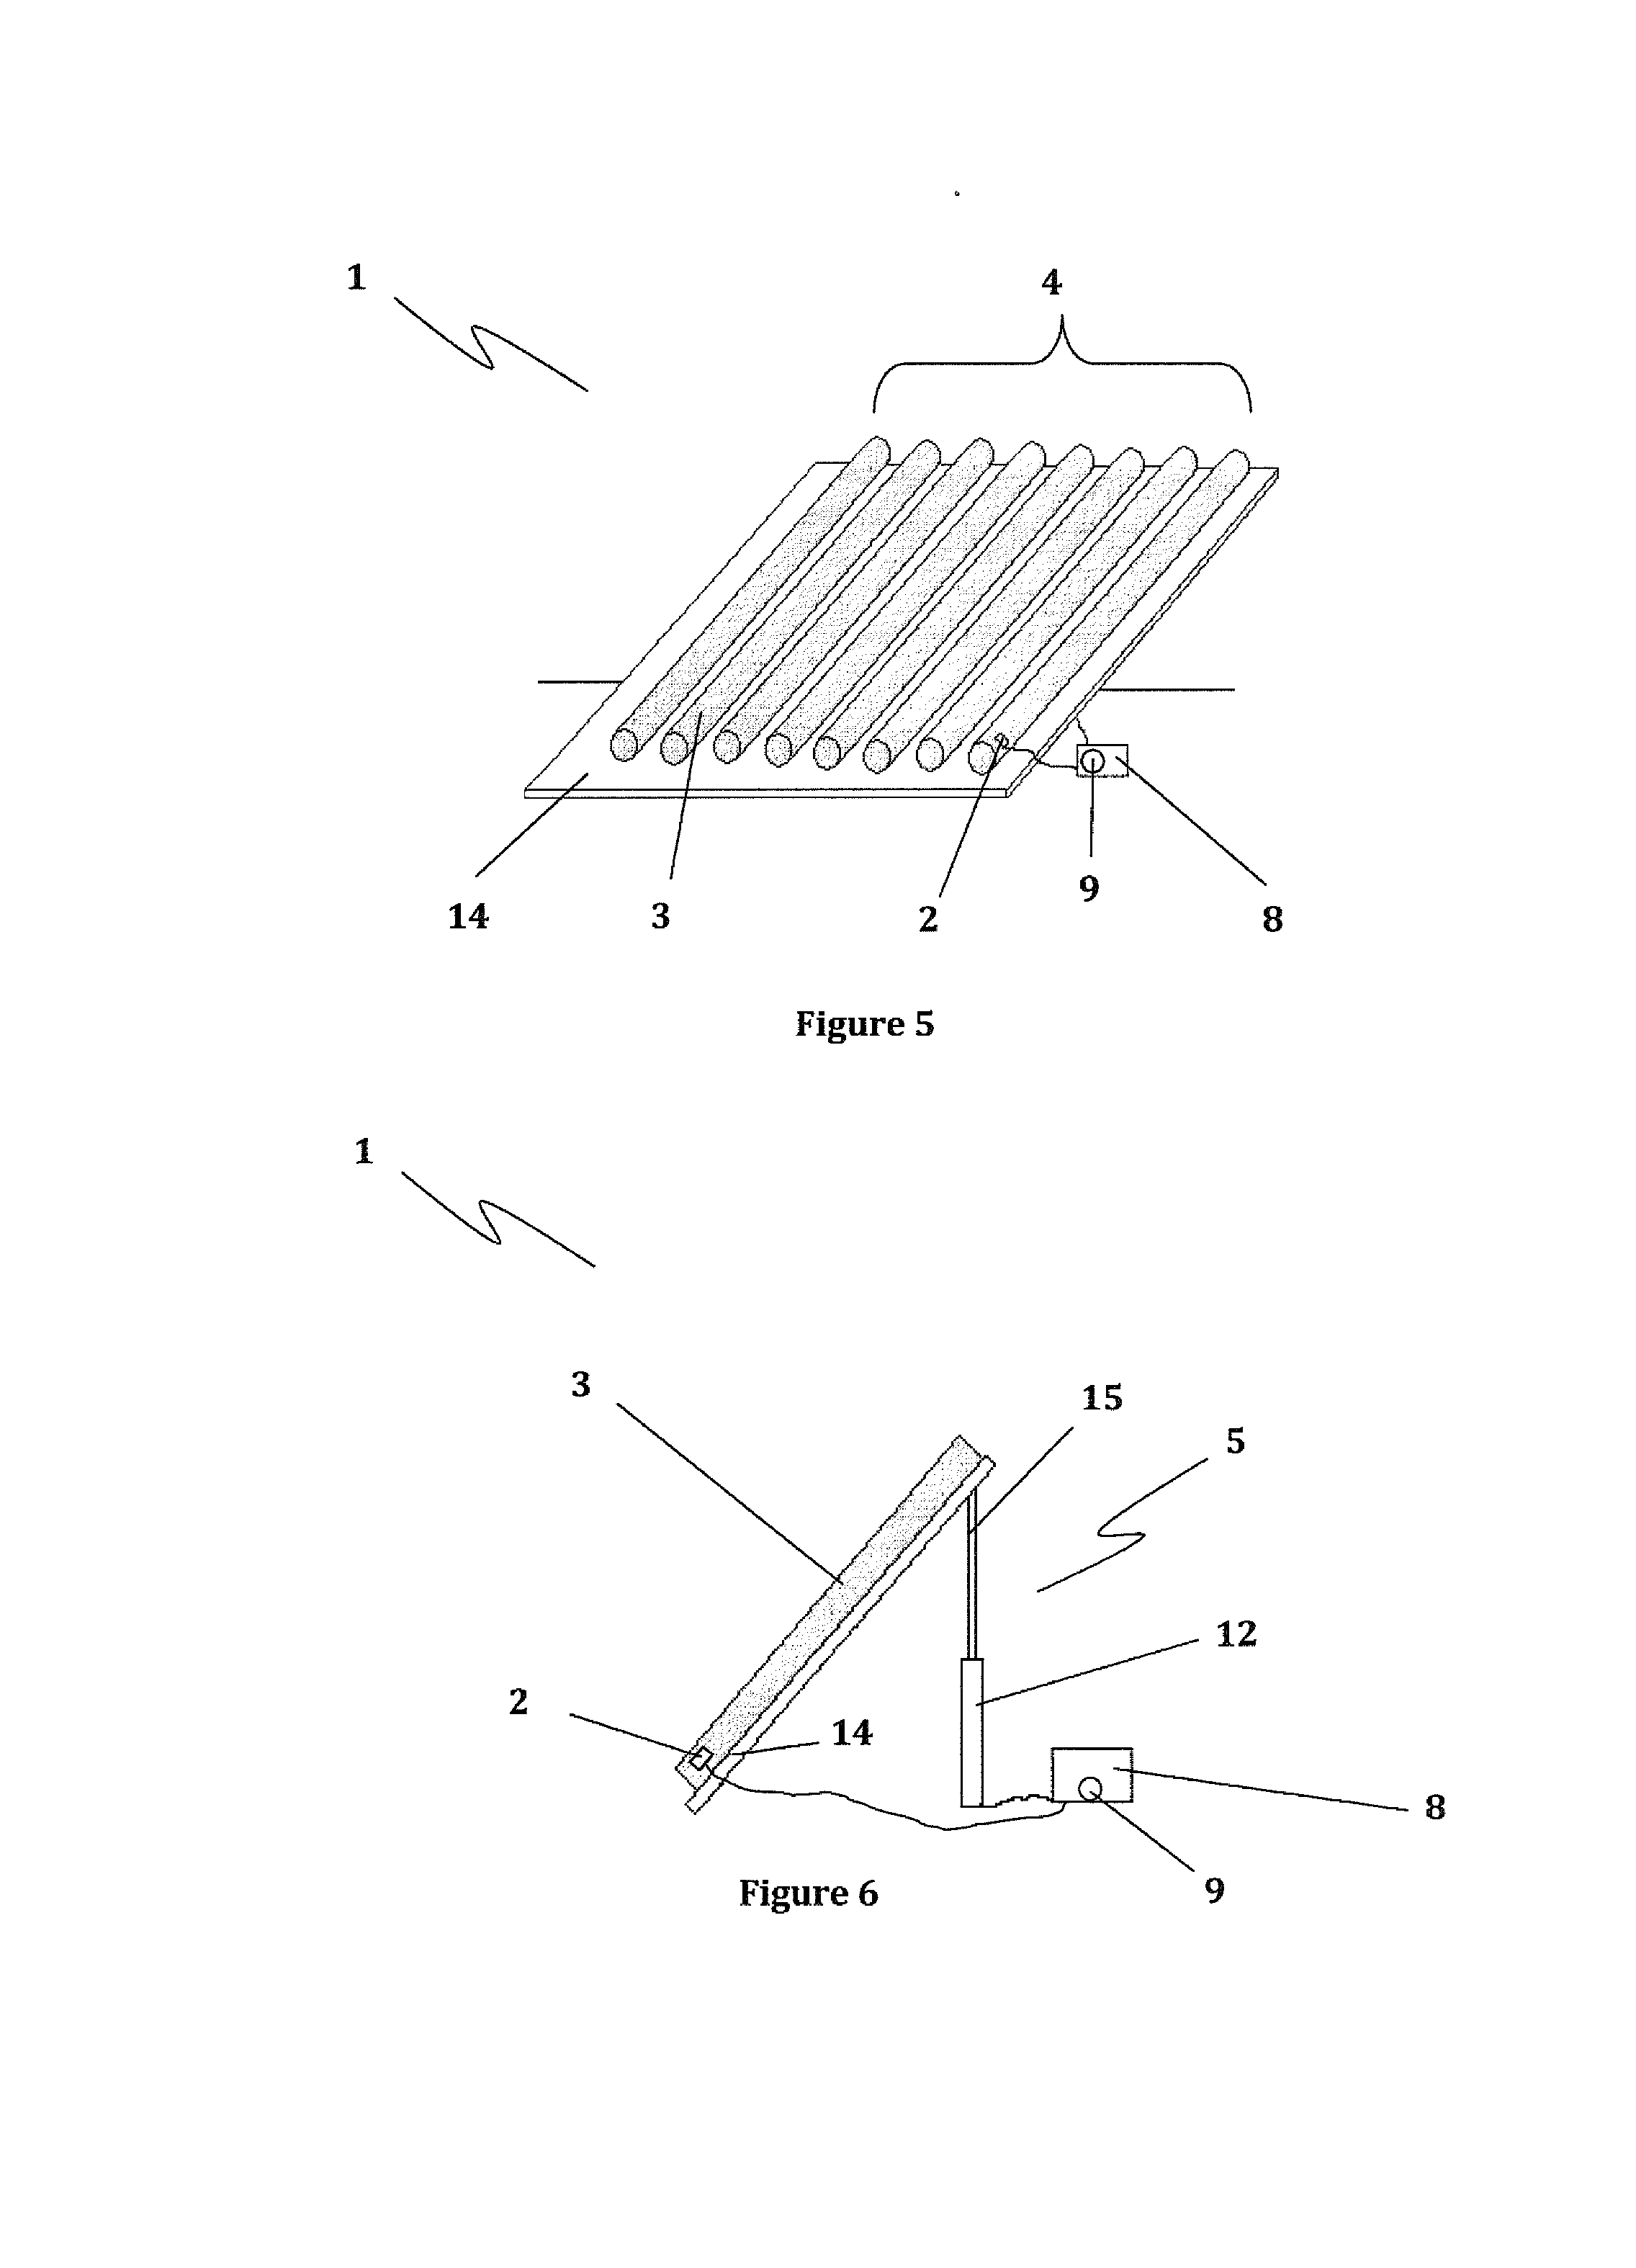 Electric Heater Wiring Diagram Friedrich Ep12 Suagrazia.org on